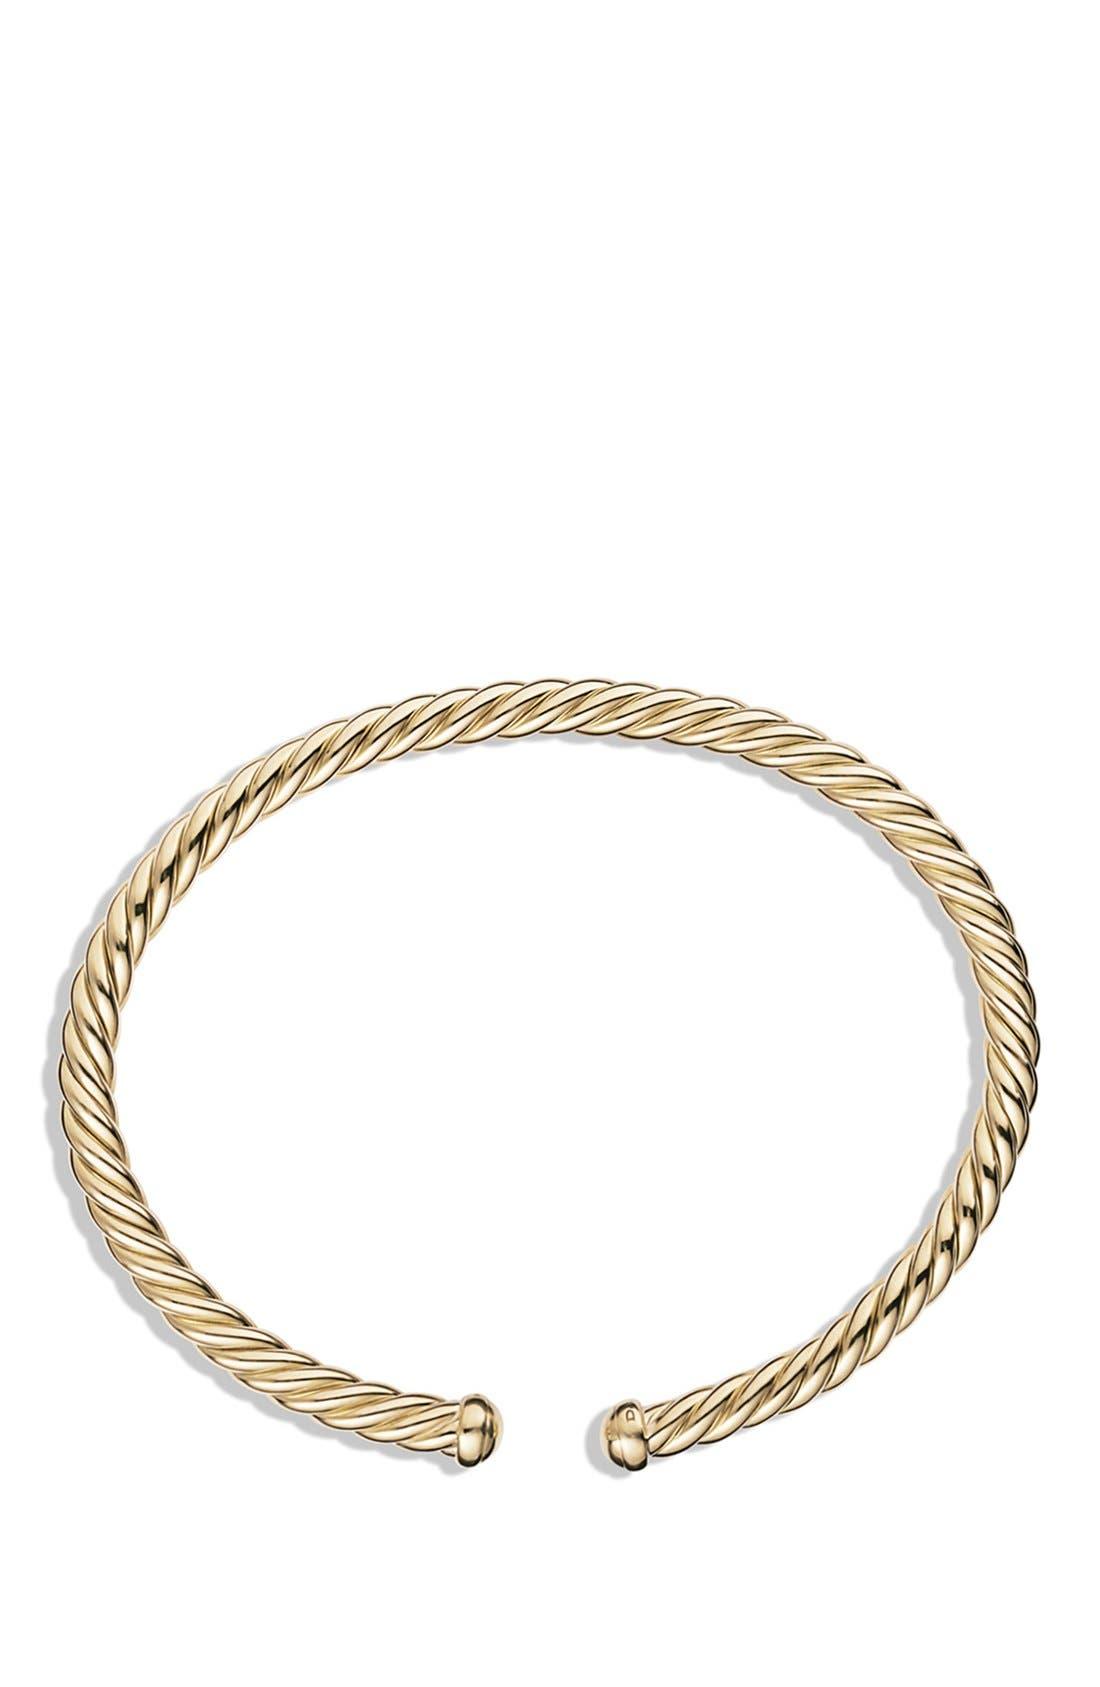 Cable Spira Bracelet in 18K Gold, 4mm,                             Alternate thumbnail 2, color,                             Gold